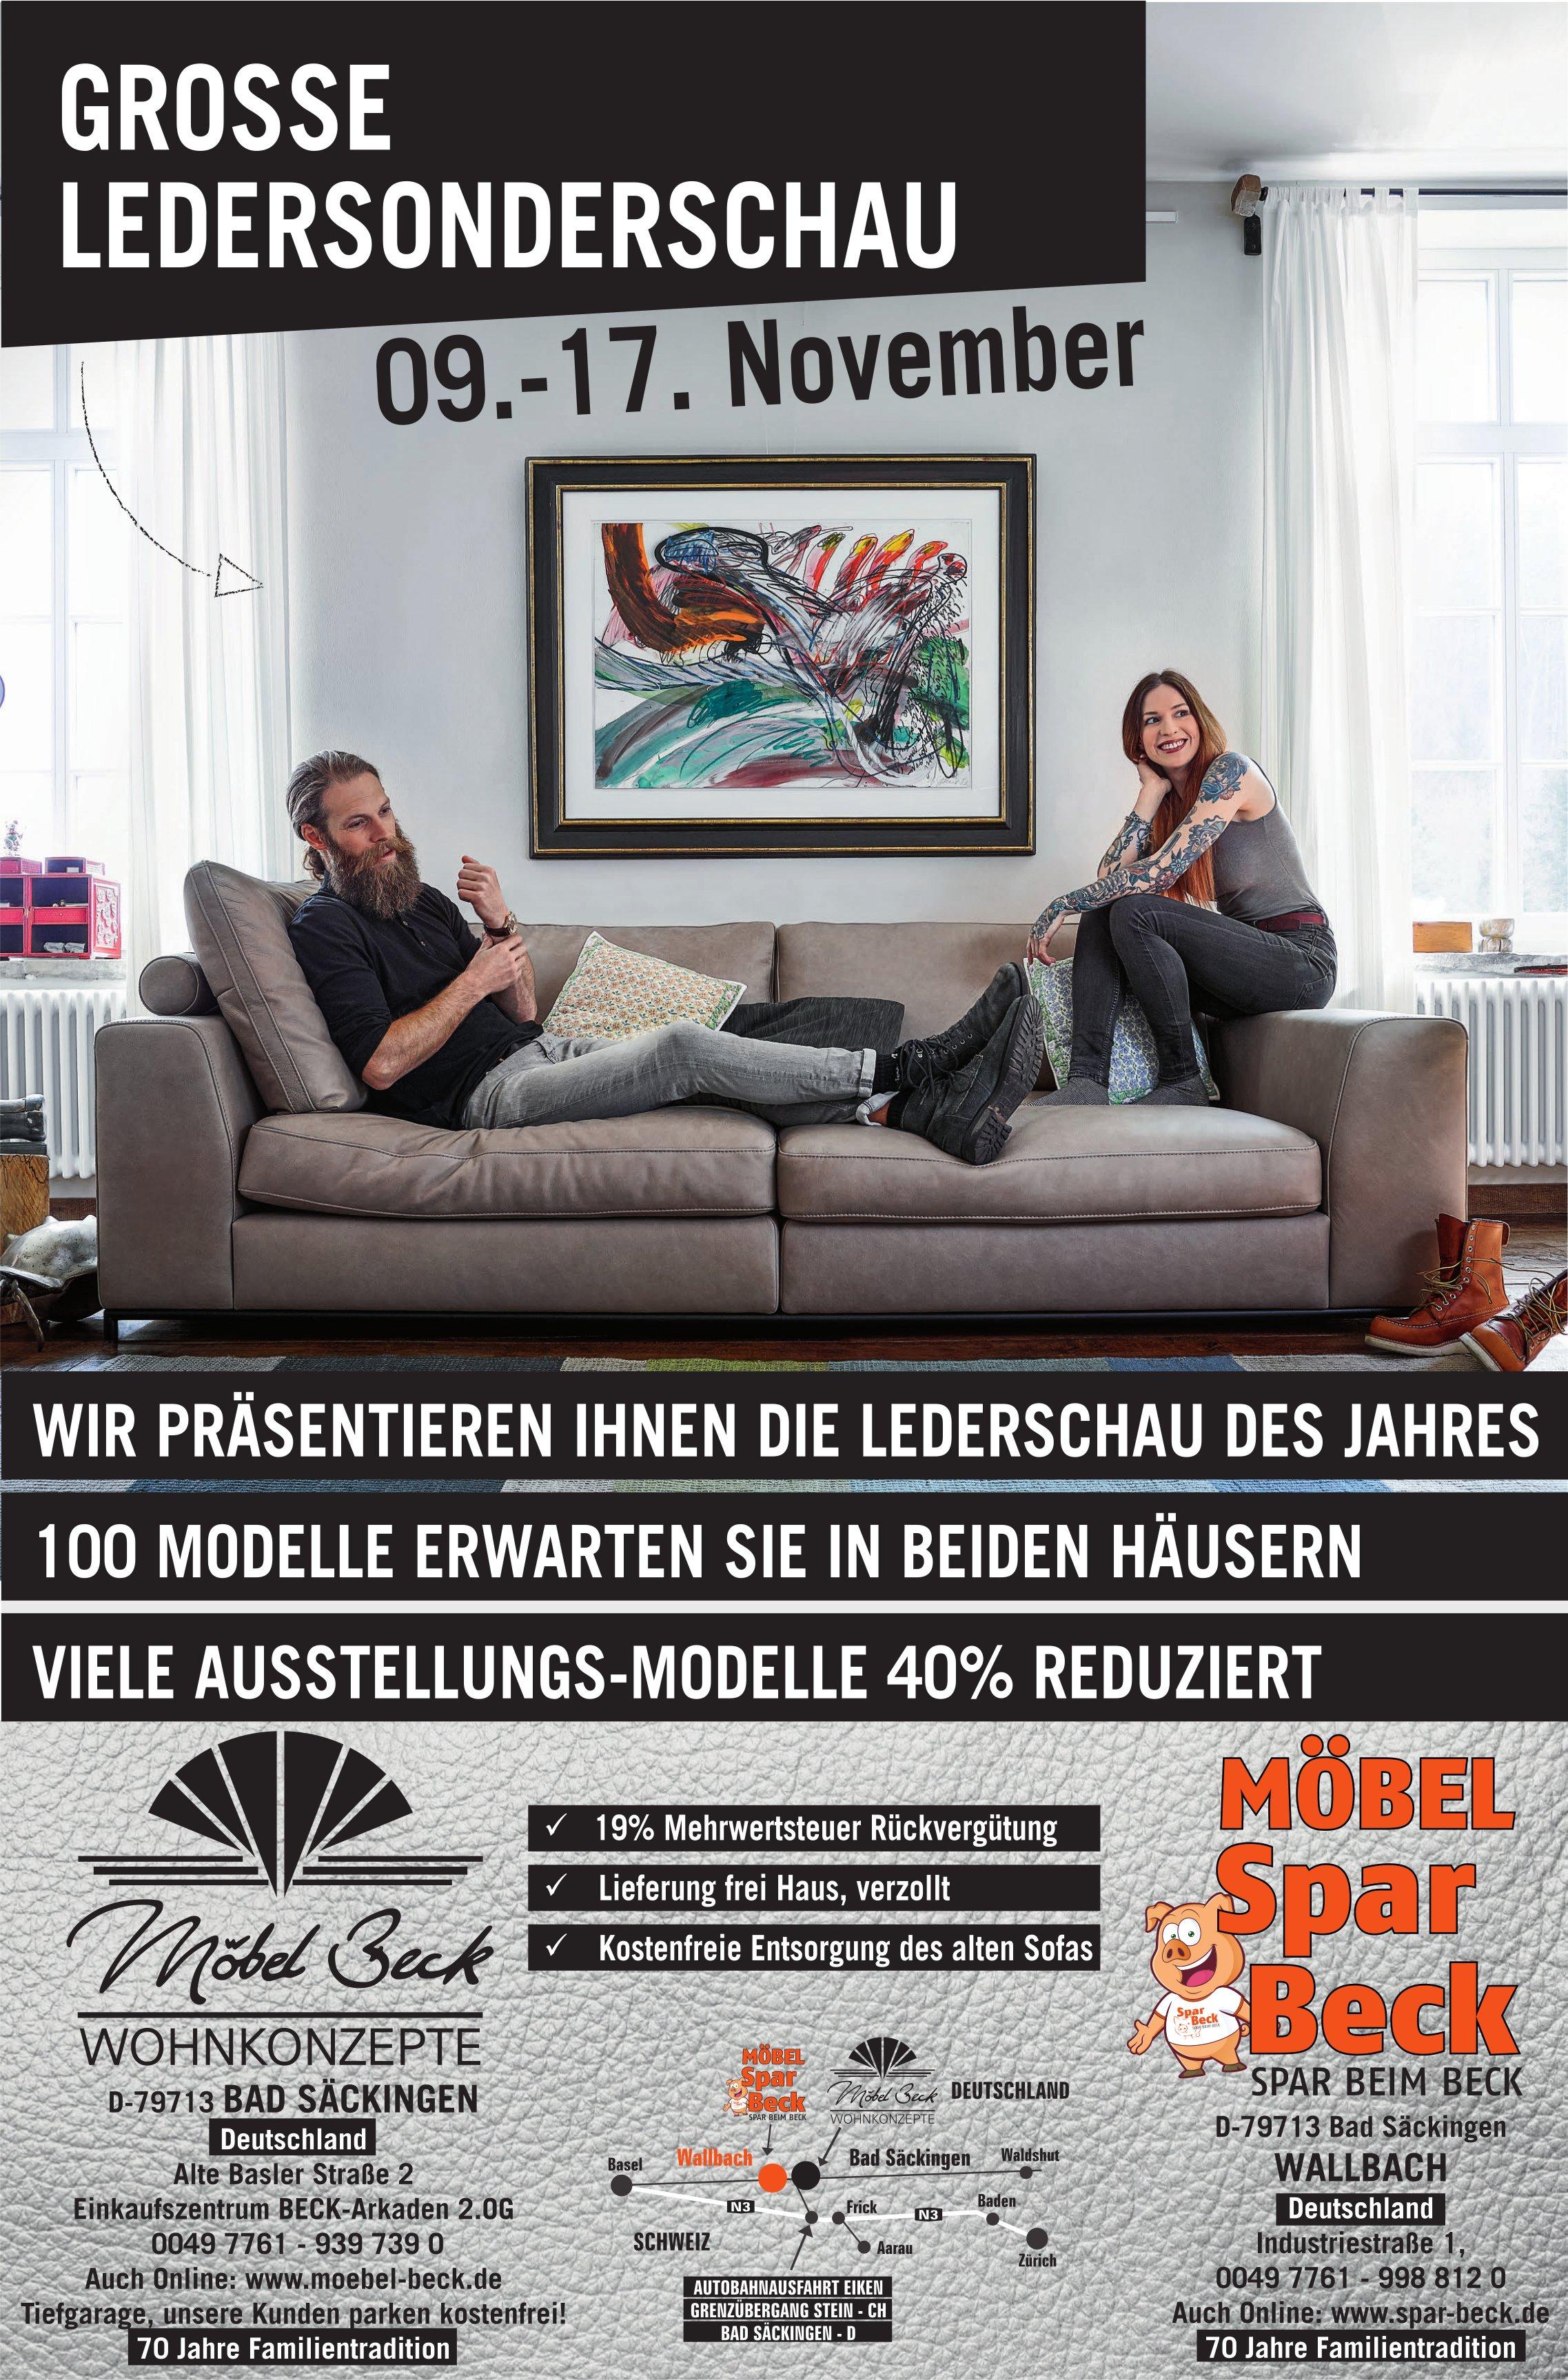 GROSSE LEDERSONDERSCHAU, 9. - 17. November, Möbel Beck, Bad Säckingen